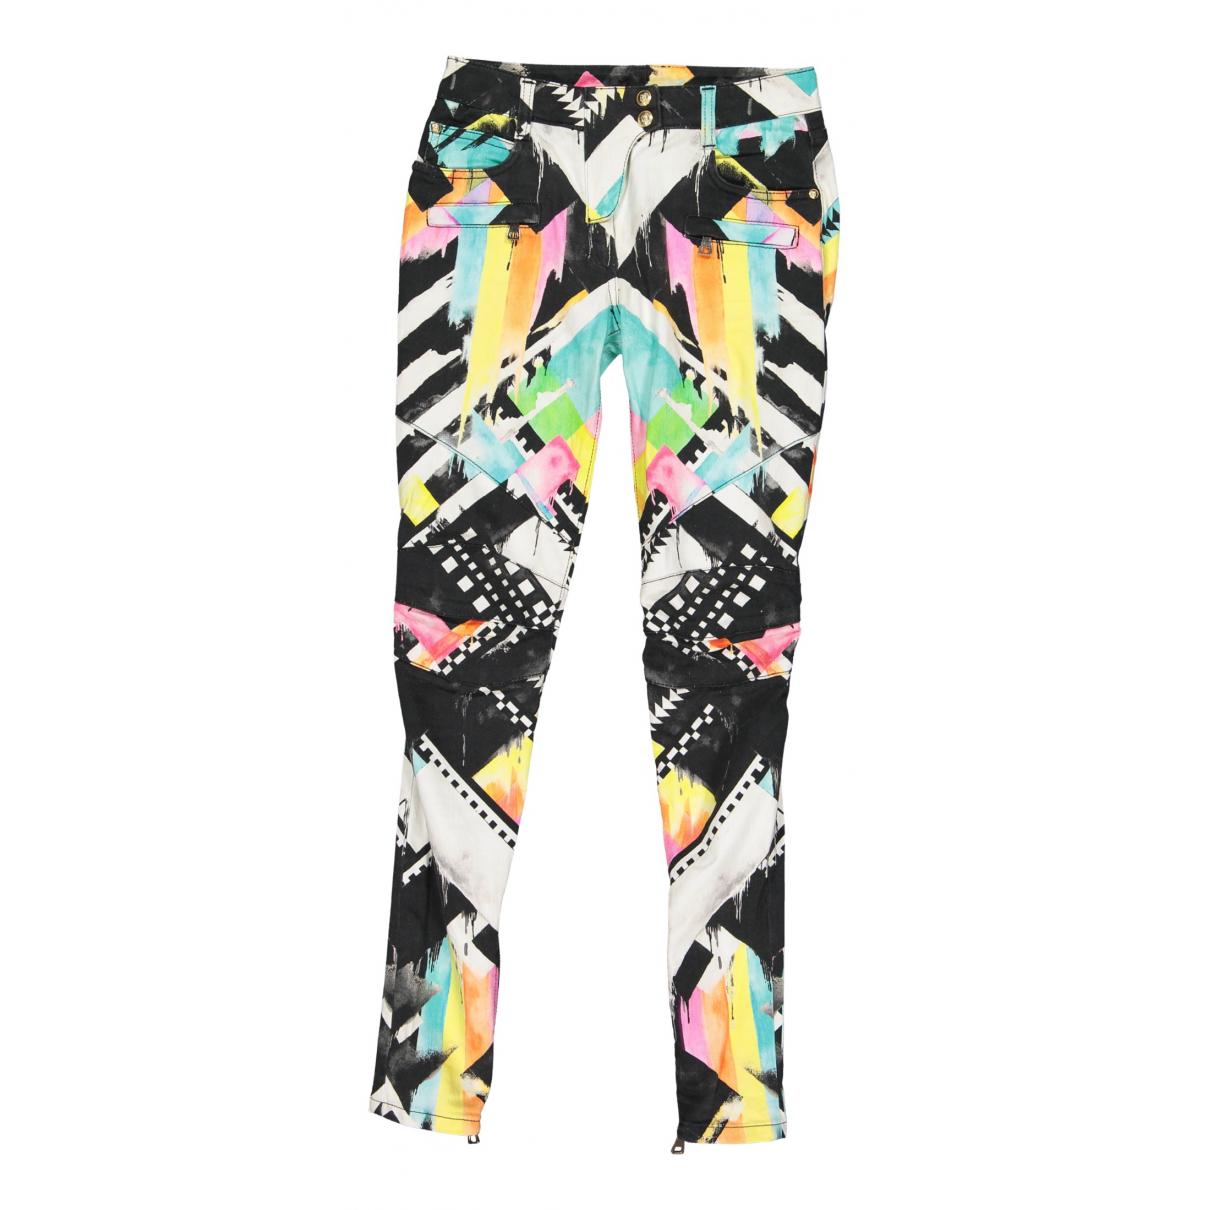 Balmain N Multicolour Cotton Trousers for Women 36 FR